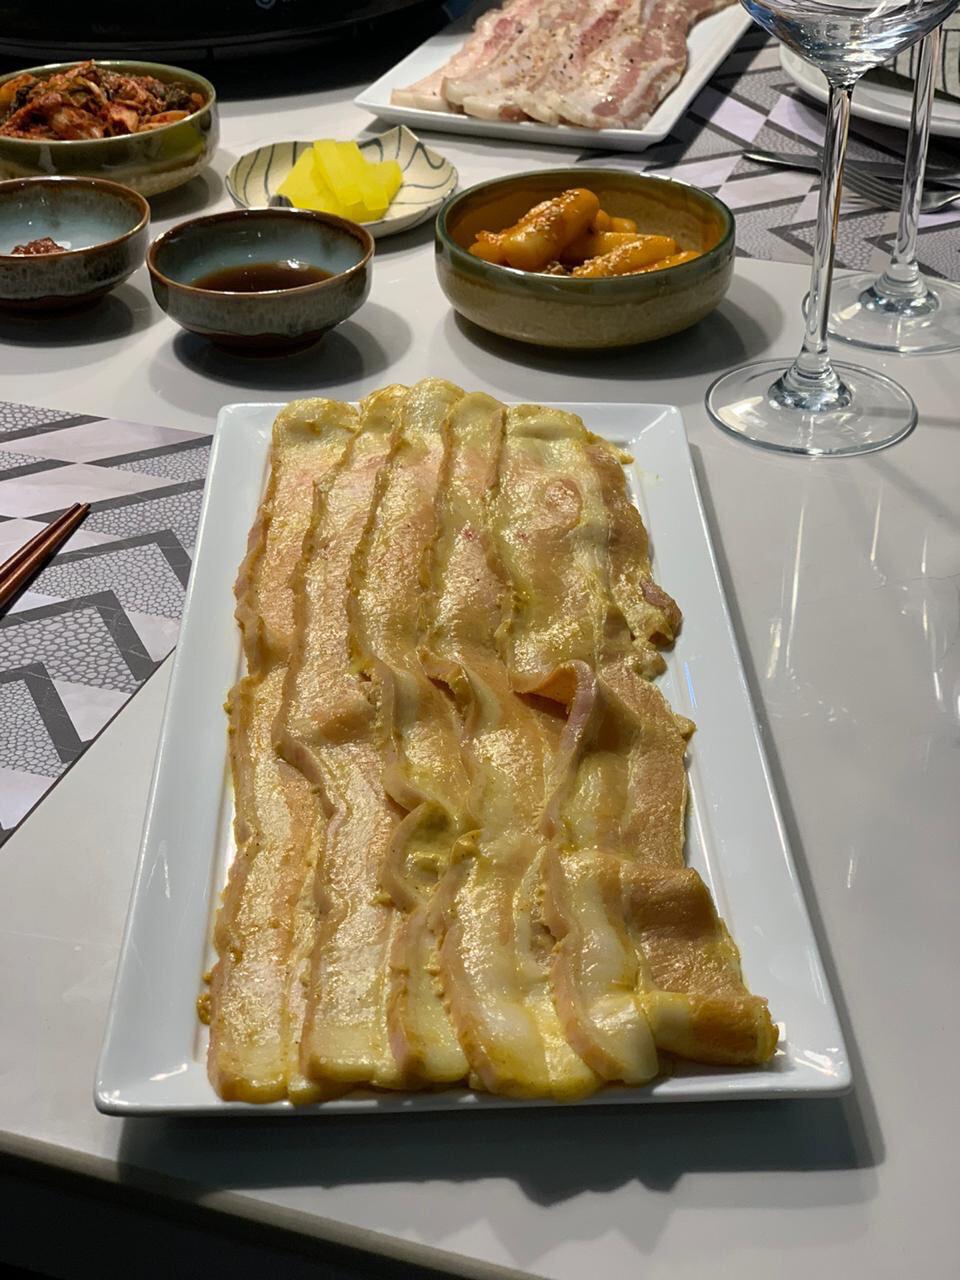 CURRIED SAMGYUPSAL US Pork Belly